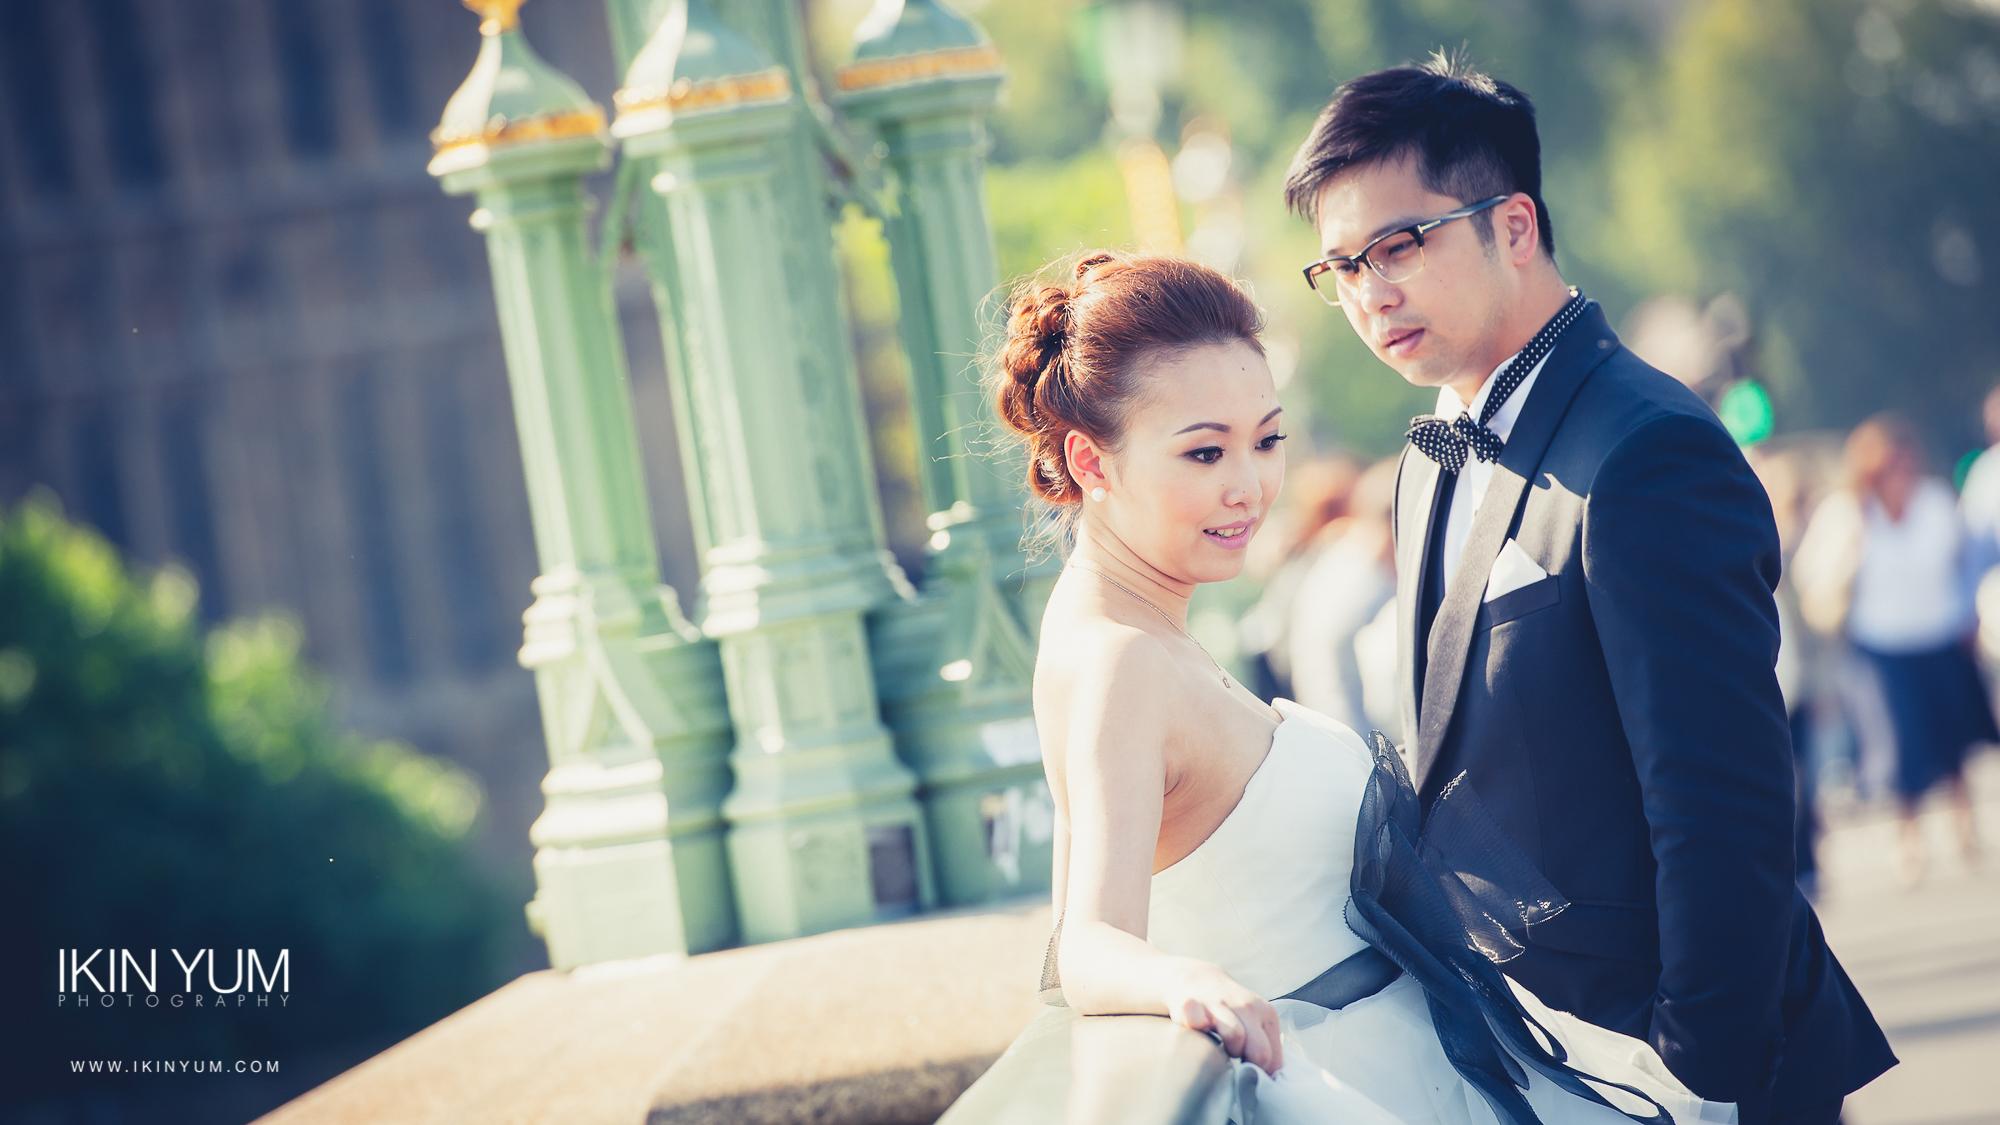 Joyce & Donald Pre Wedding Shoot - Ikin Yum Photography-036.jpg